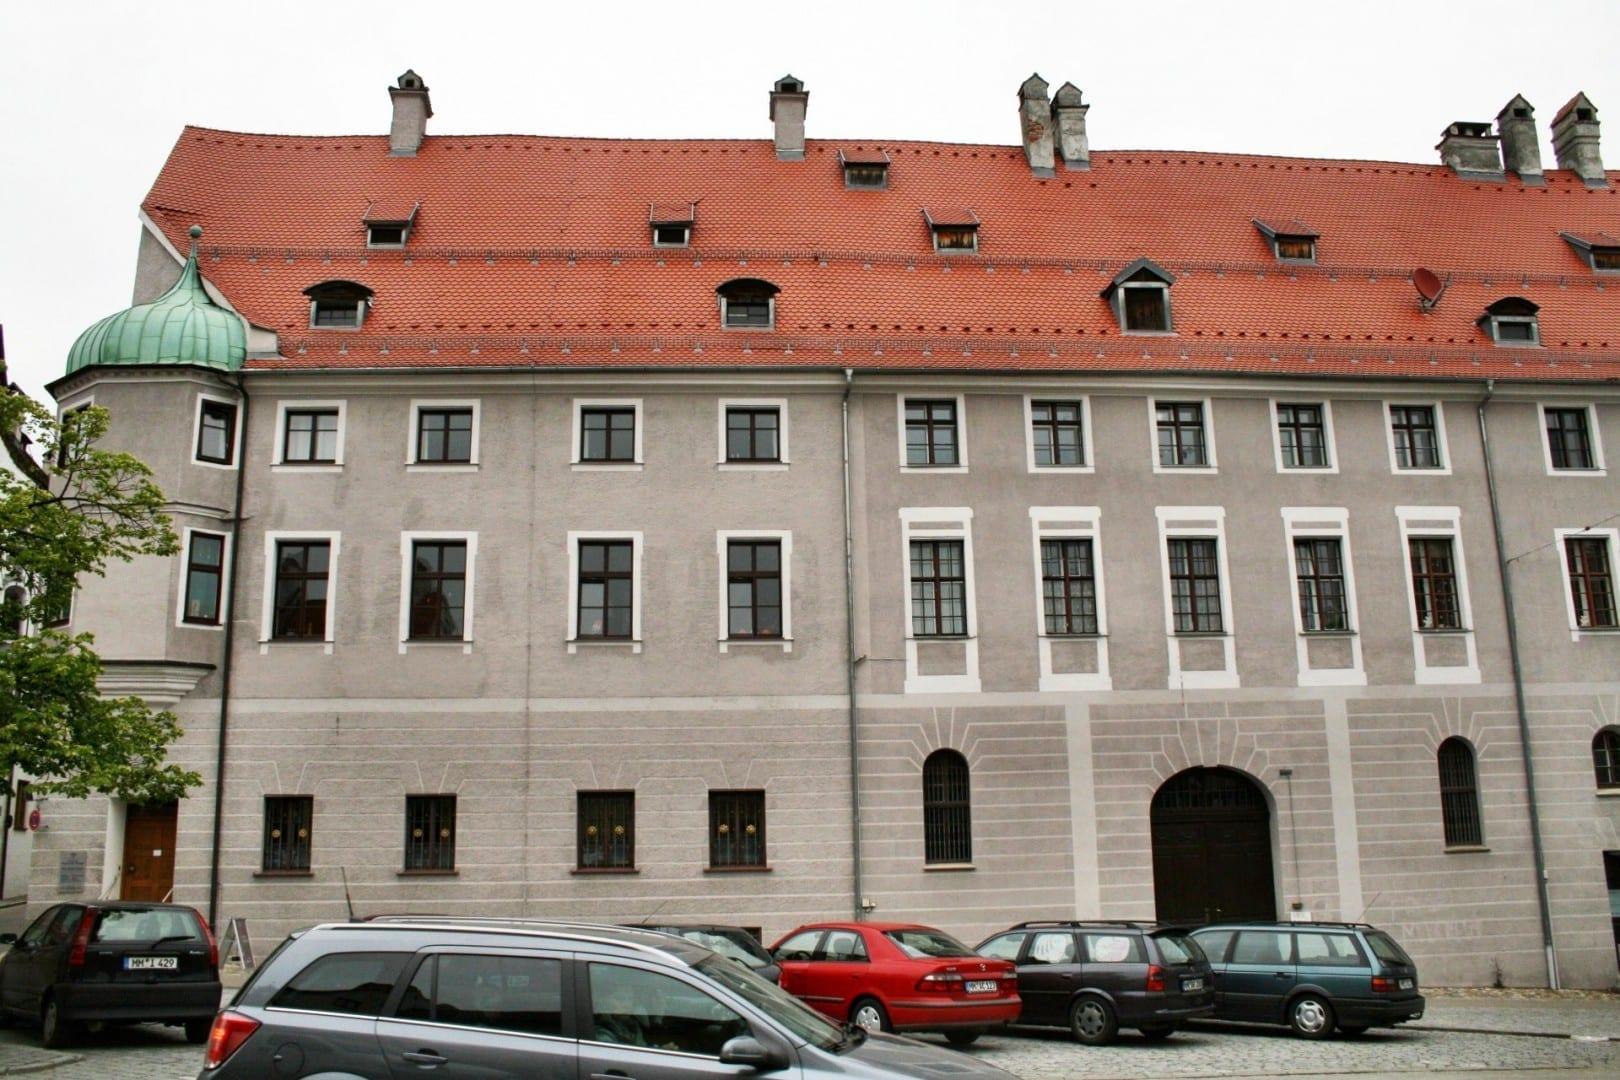 Edificio Fugger Memmingen Alemania